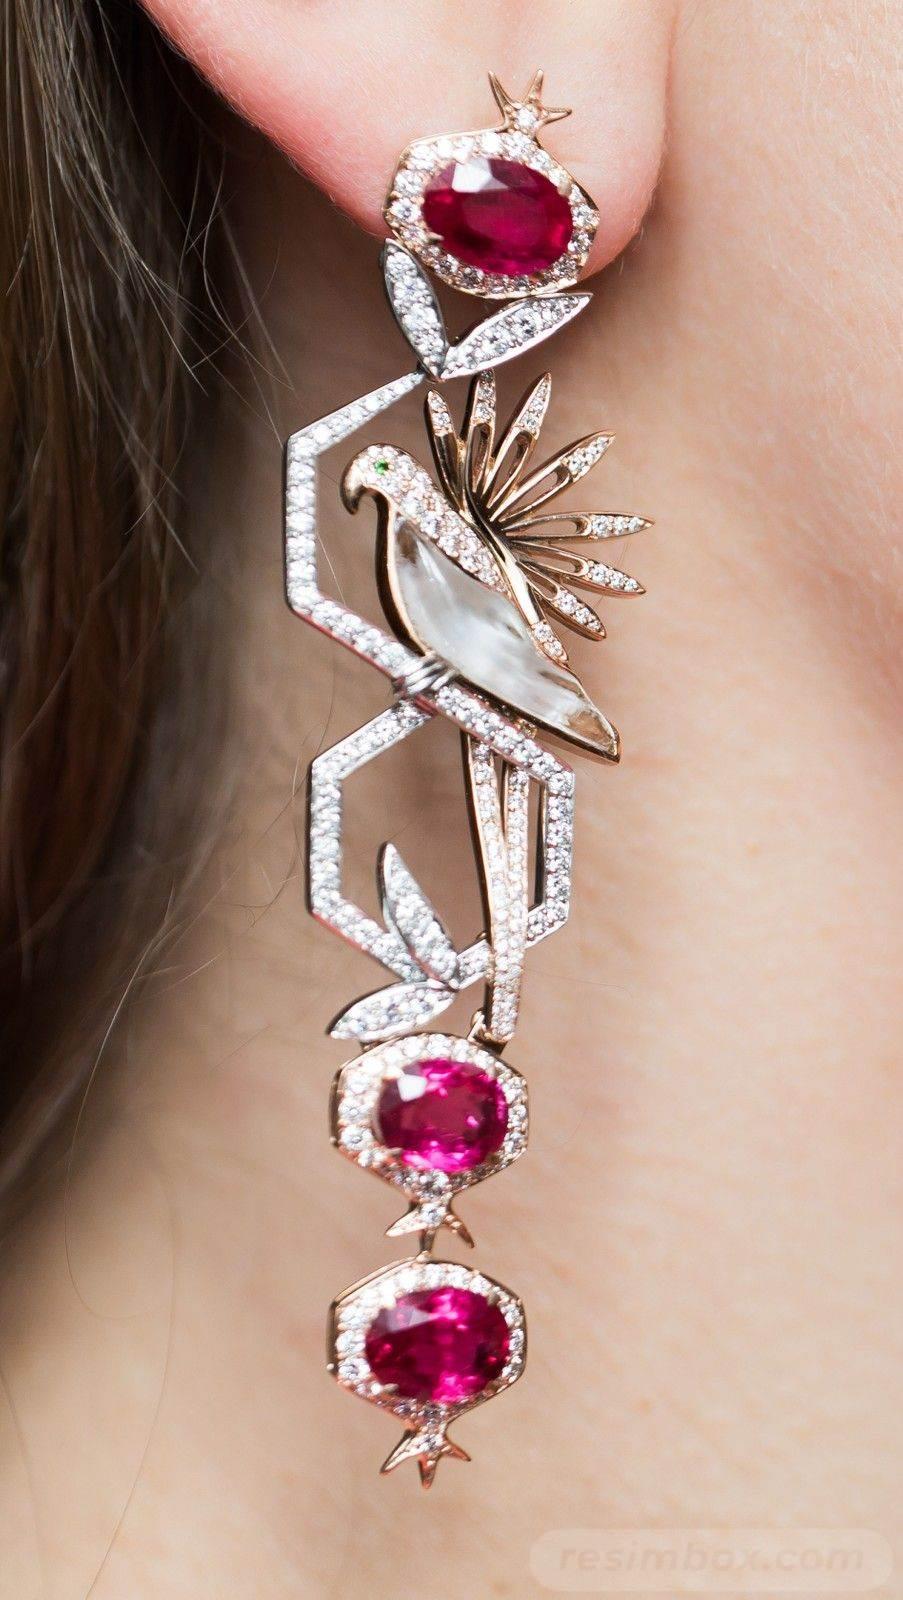 gemologue-animal-jewelry-curation-141652350766855927